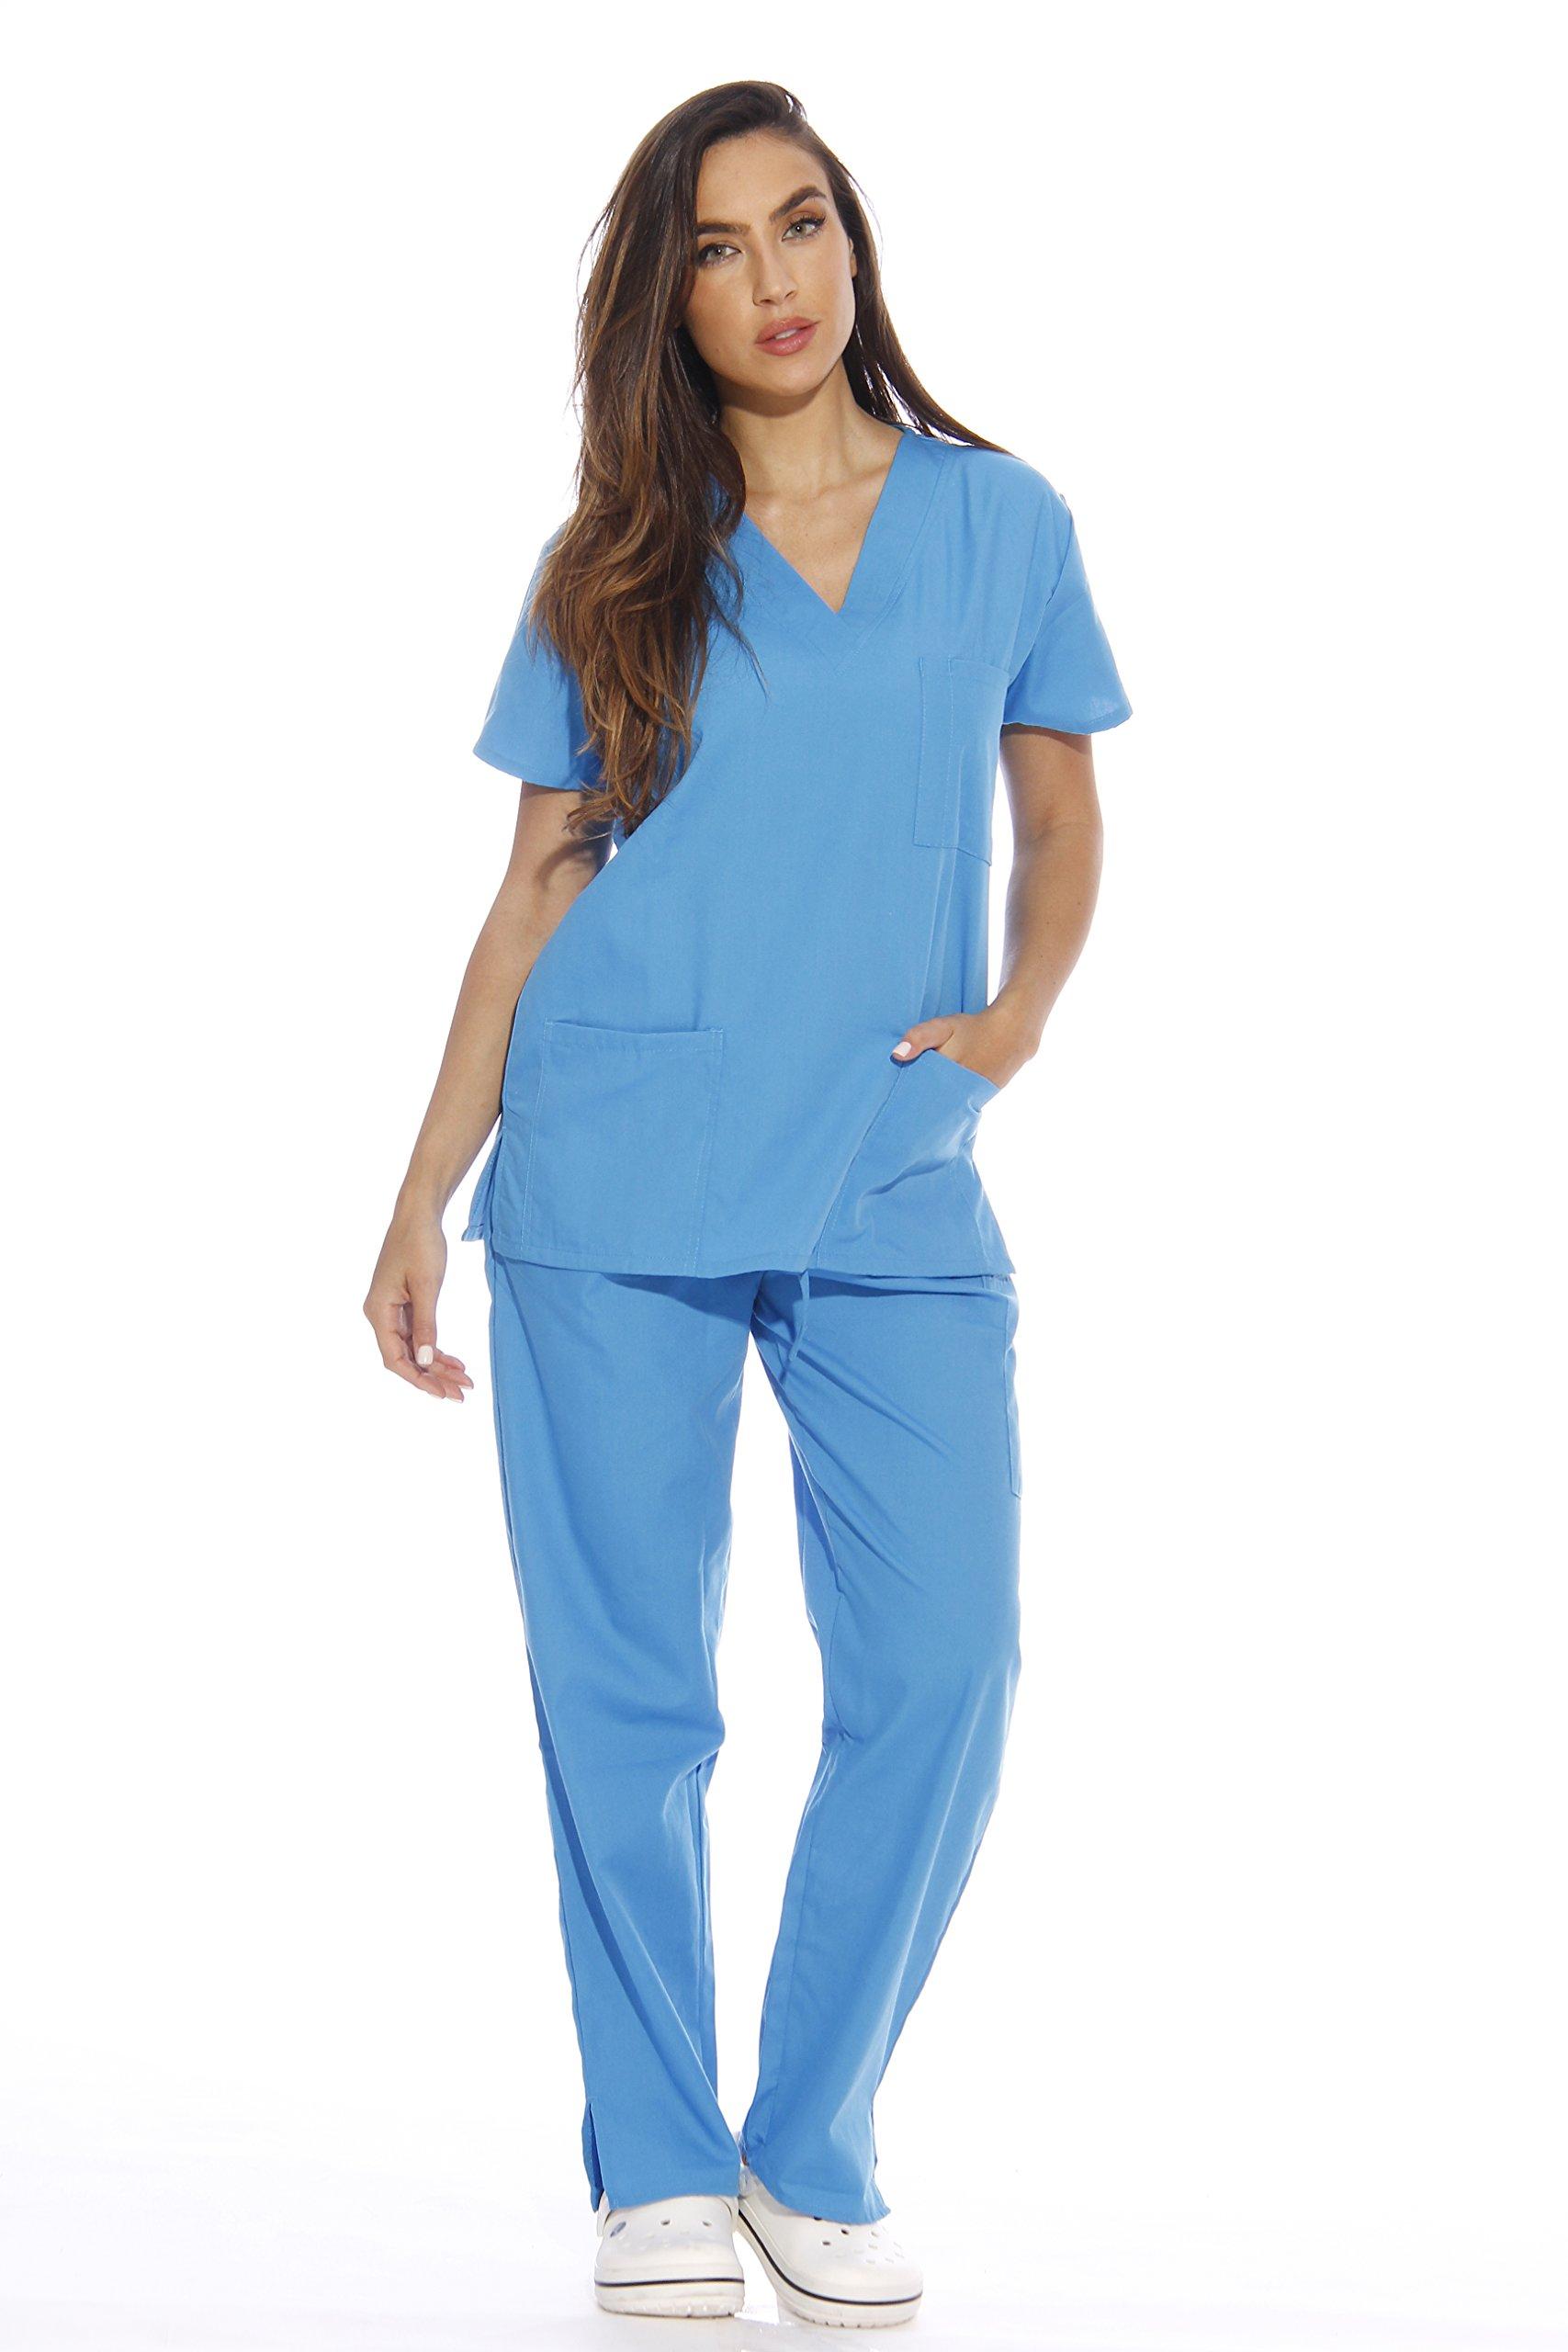 22254V-S Malibu Blue Just Love Women's Scrub Sets / Medical Scrubs / Nursing Scrubs